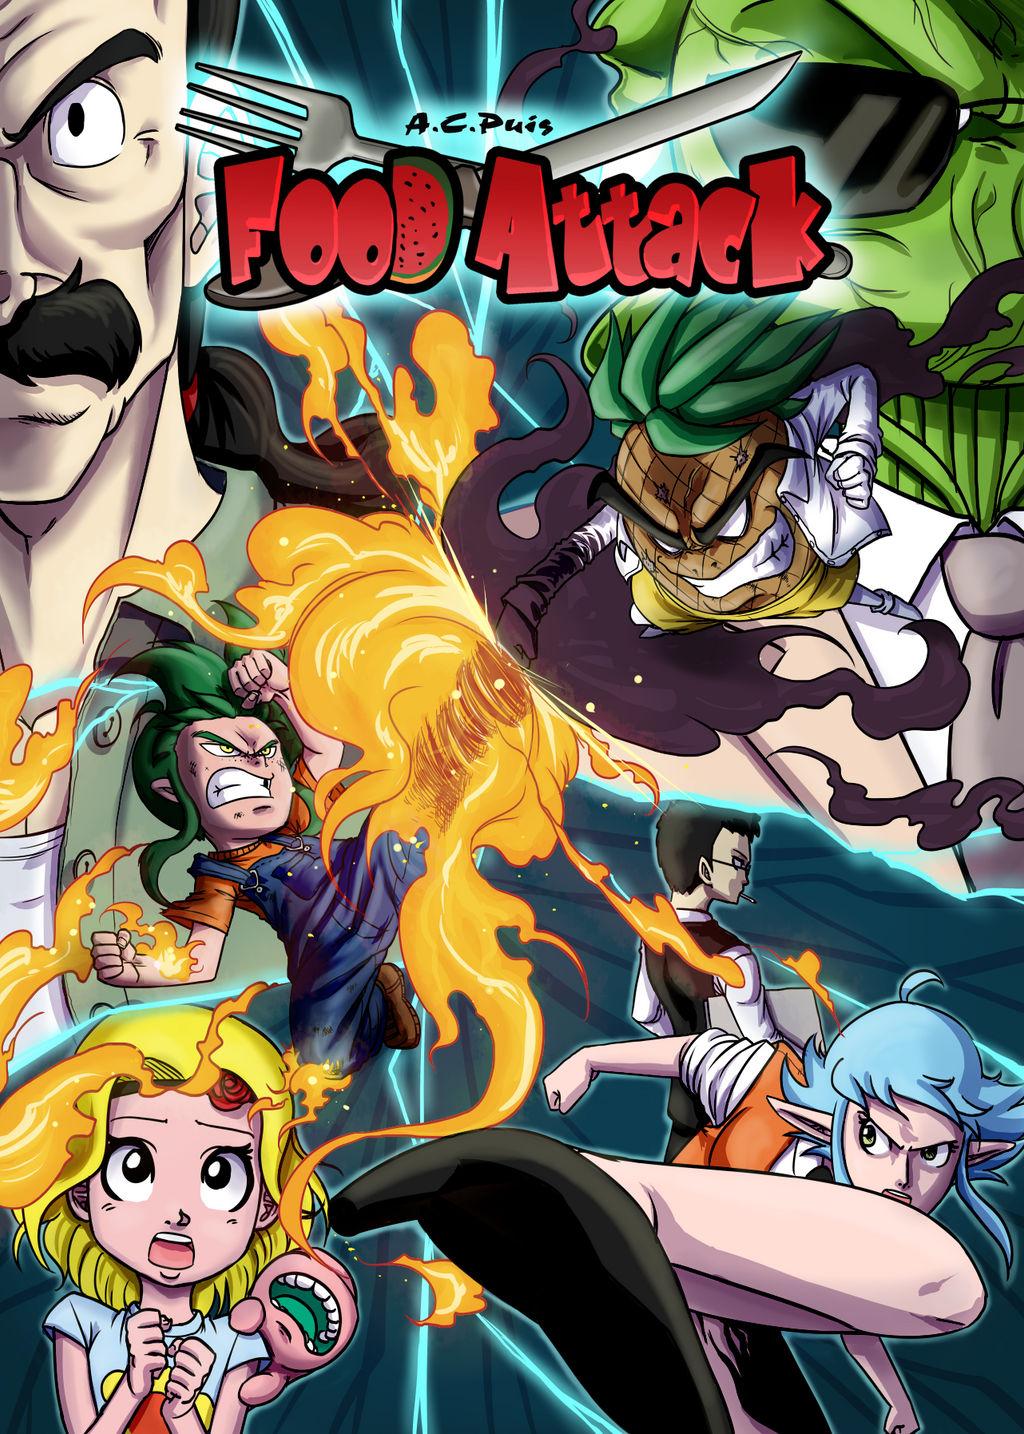 Food Attack: Portada del Volumen 2